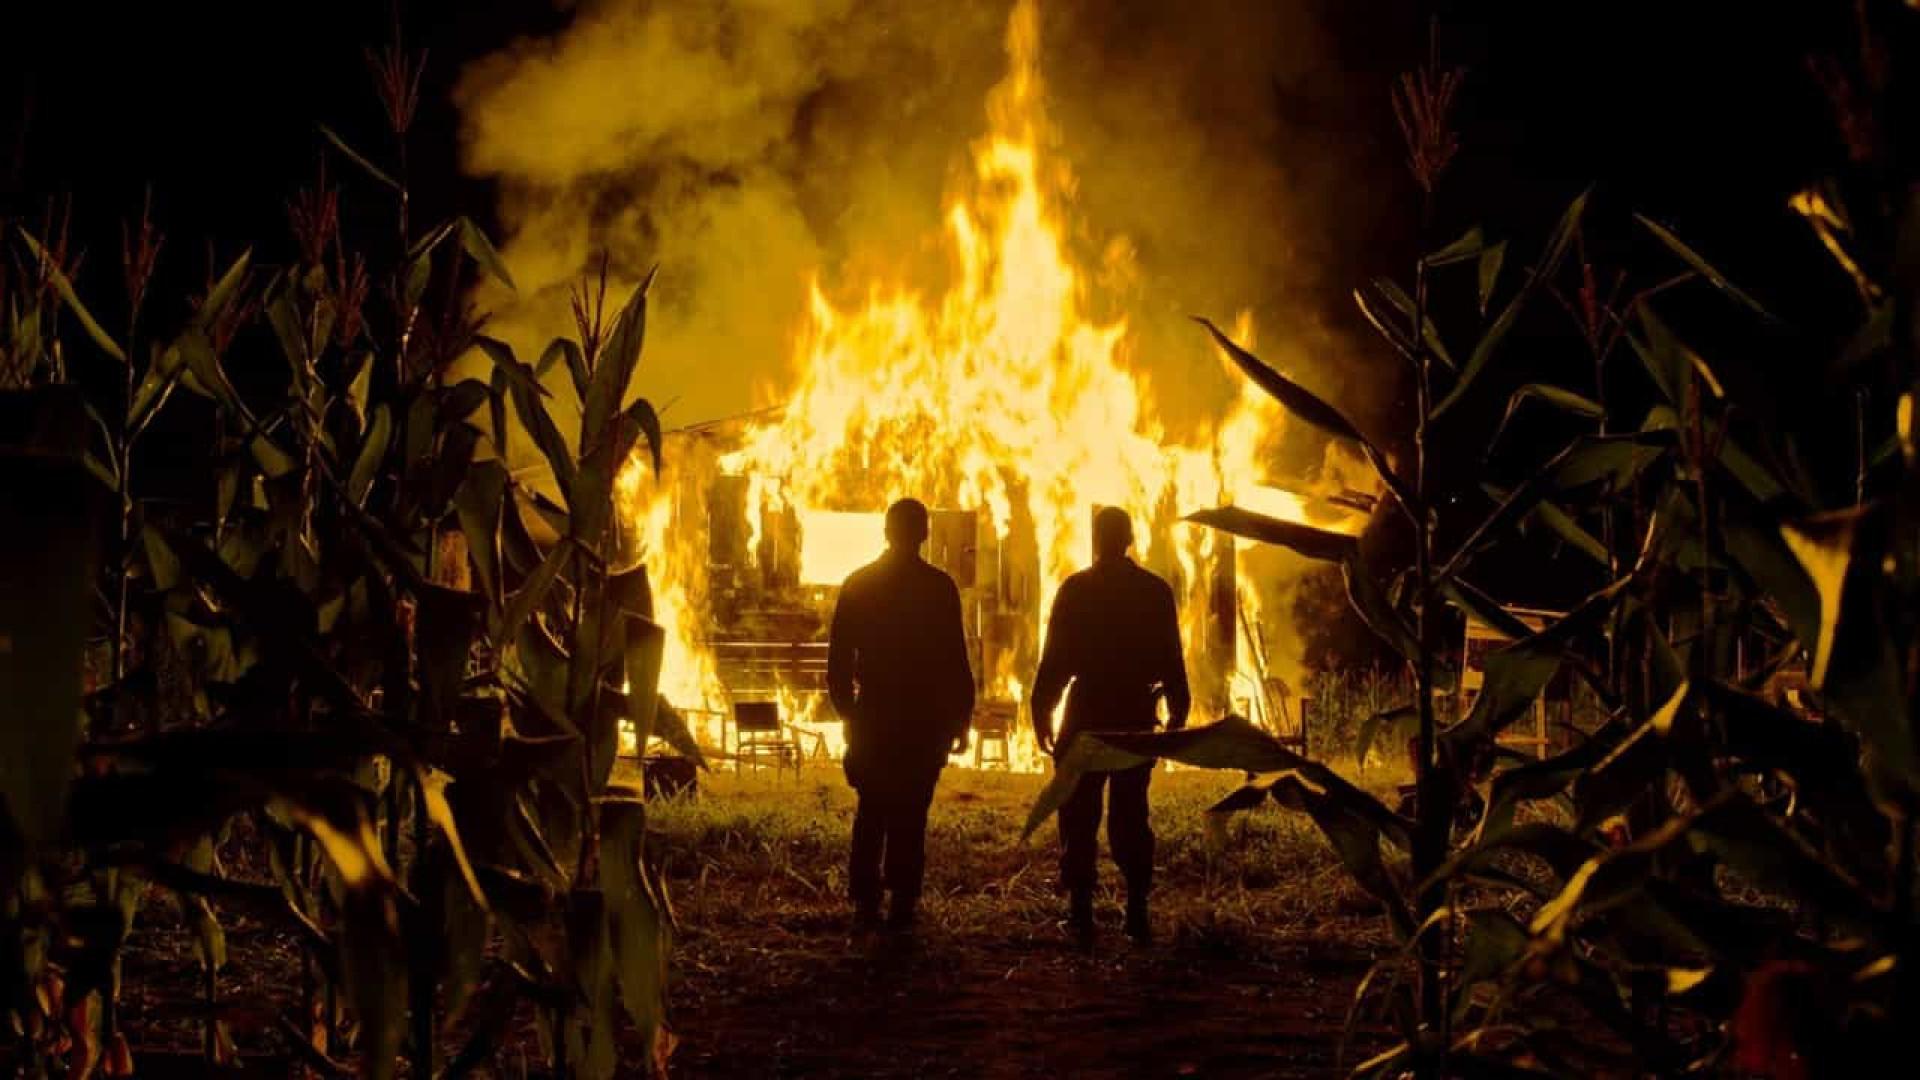 'Macabro' mostra detalhes obscuros de crimes dos irmãos necrófilos